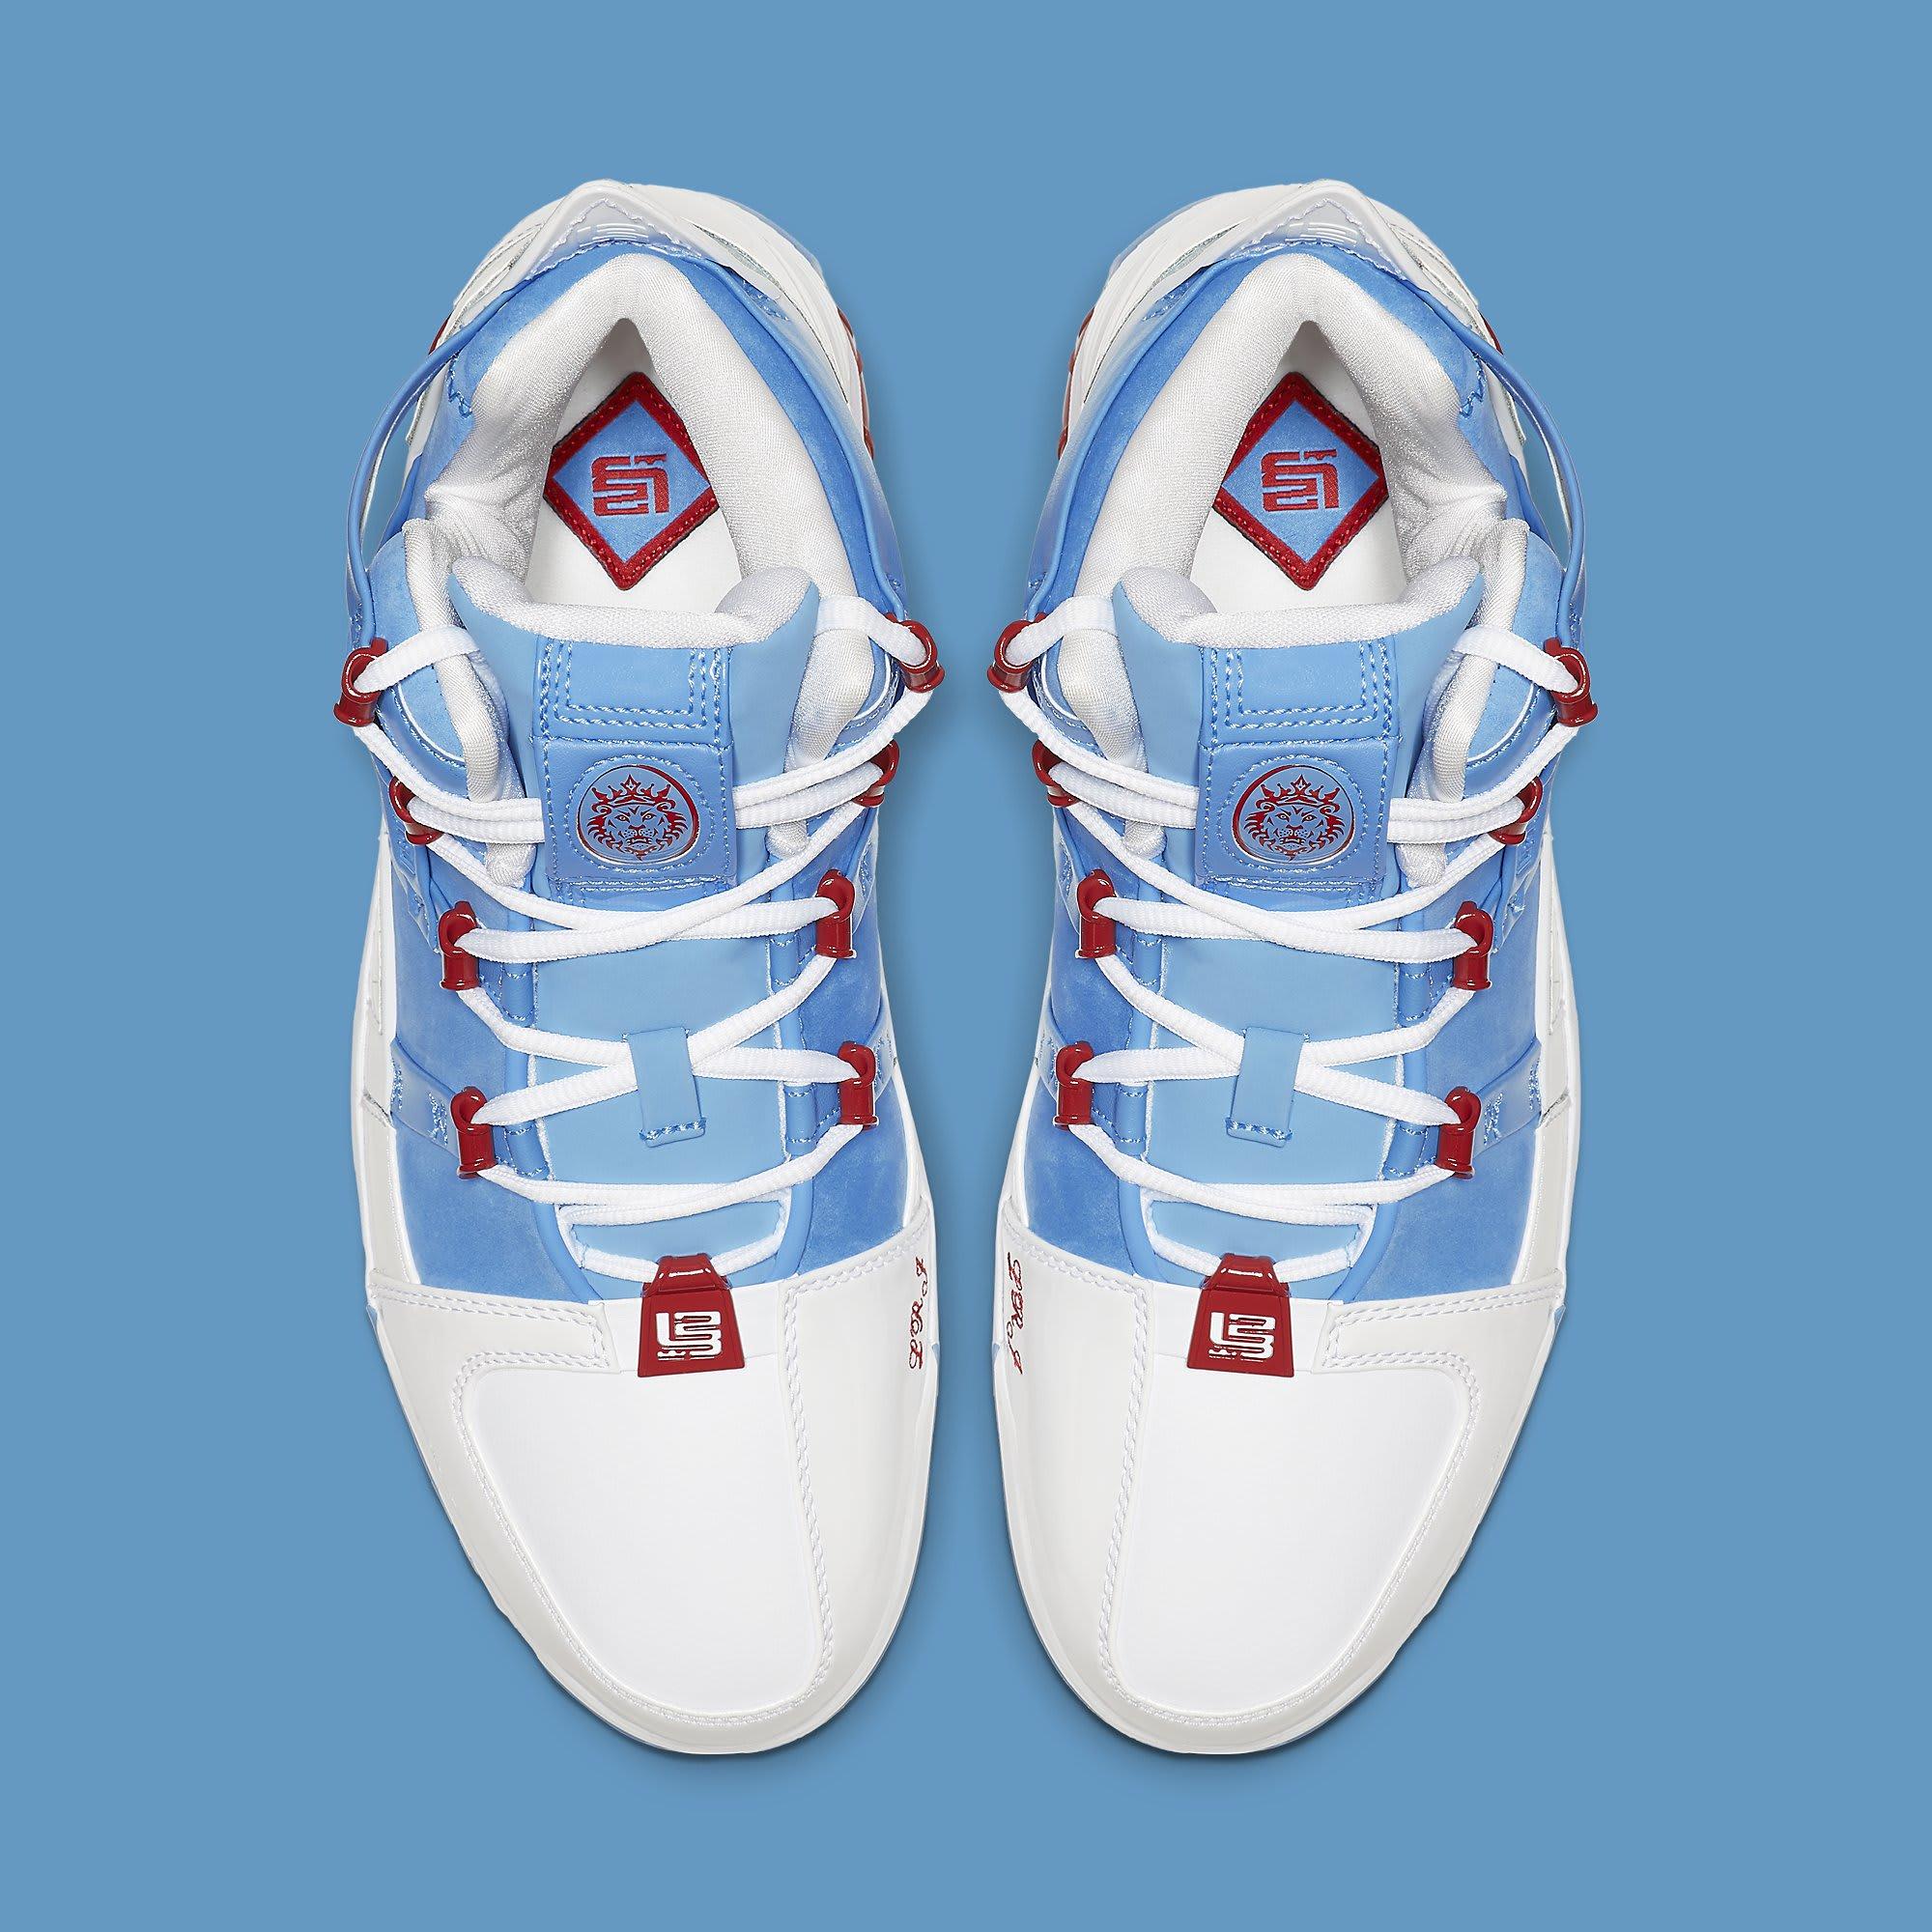 Nike Zoom LeBron 3 QS 'Houston All-Star' AO2434-400 Top